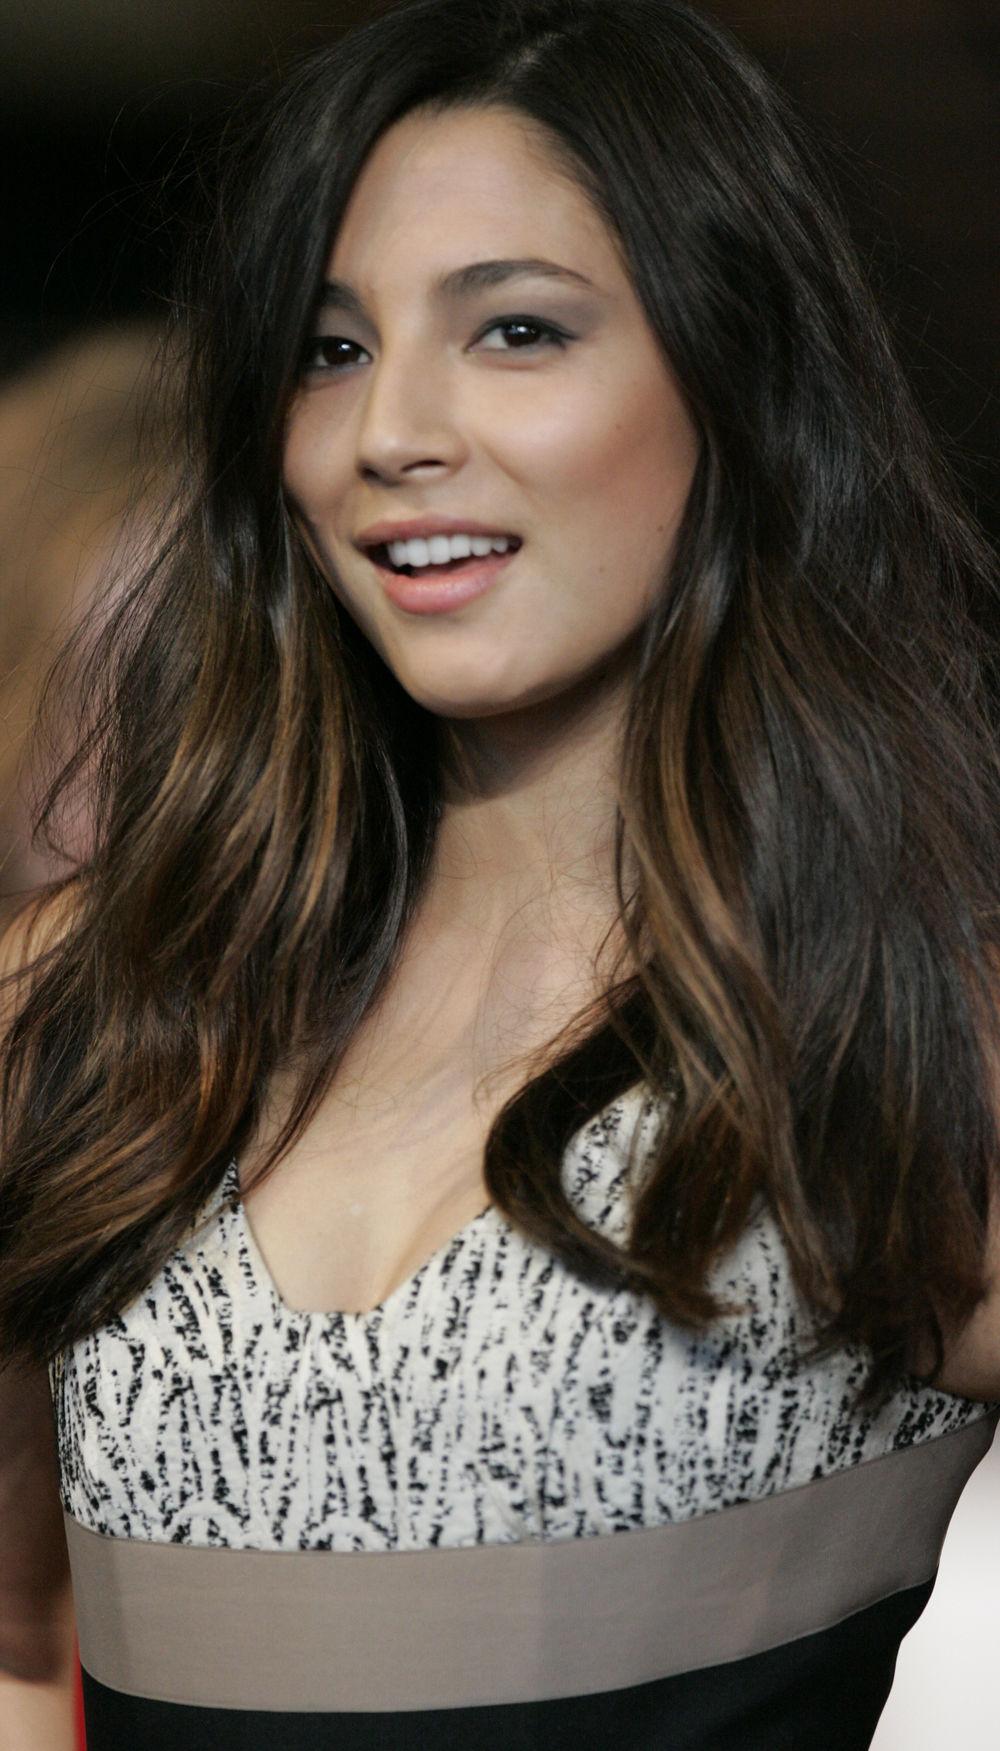 Photo of Jessica Gomes: Australian model